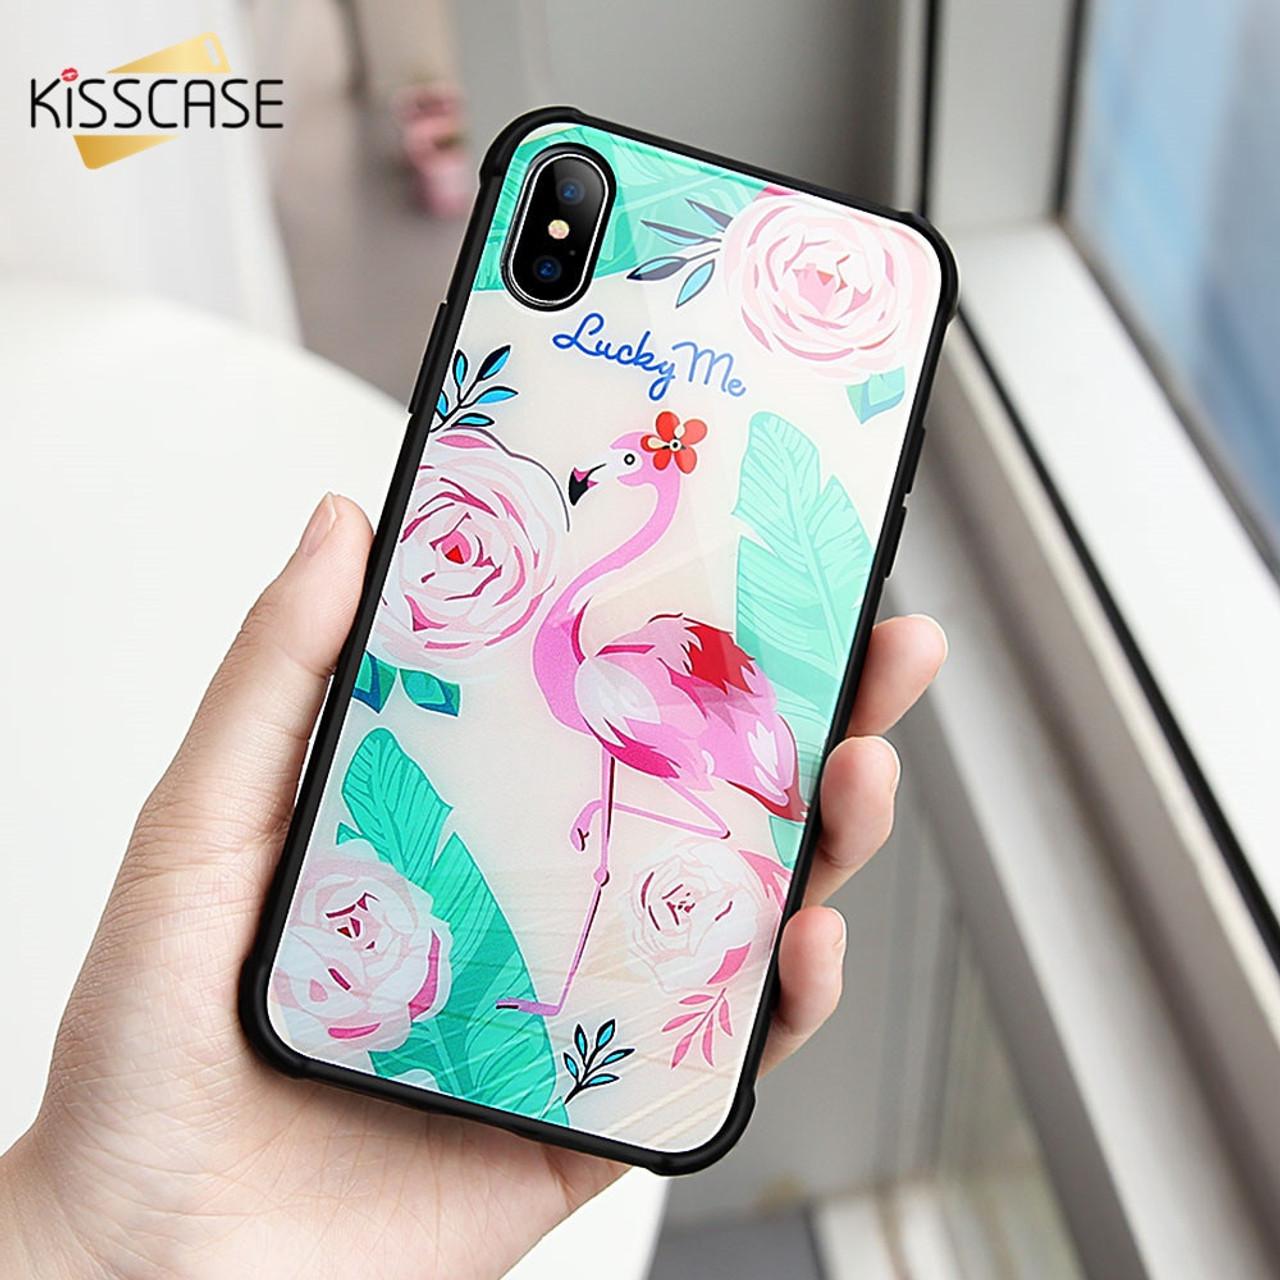 35546ca005 KISSCASE Tempered Glass Phone Case for iPhone X 10 Cover Cute Unicorn  Flamingo Owl Phone Case for iPhone 6 7 8 Plus Fundas Coque